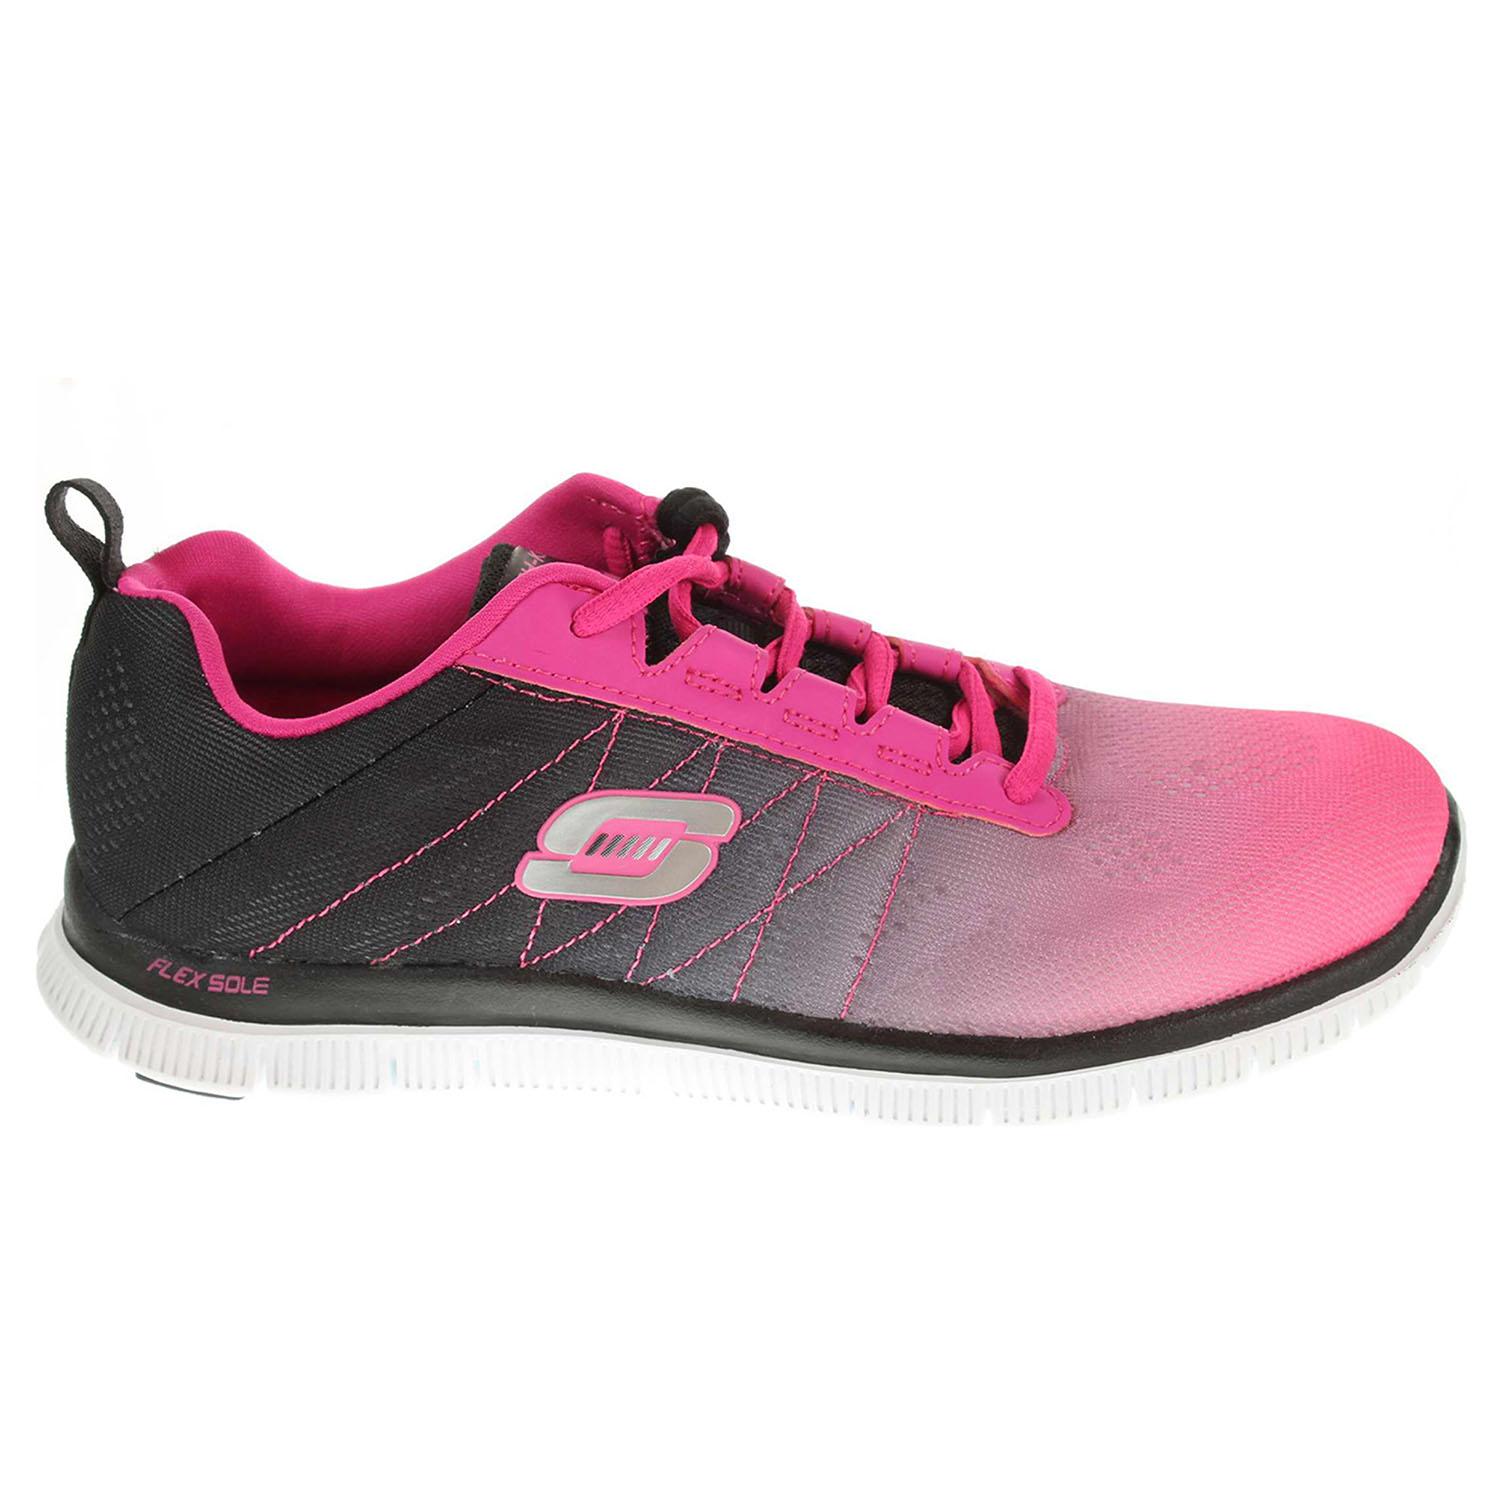 Skechers Flex Appeal New Arrival hot pink 41